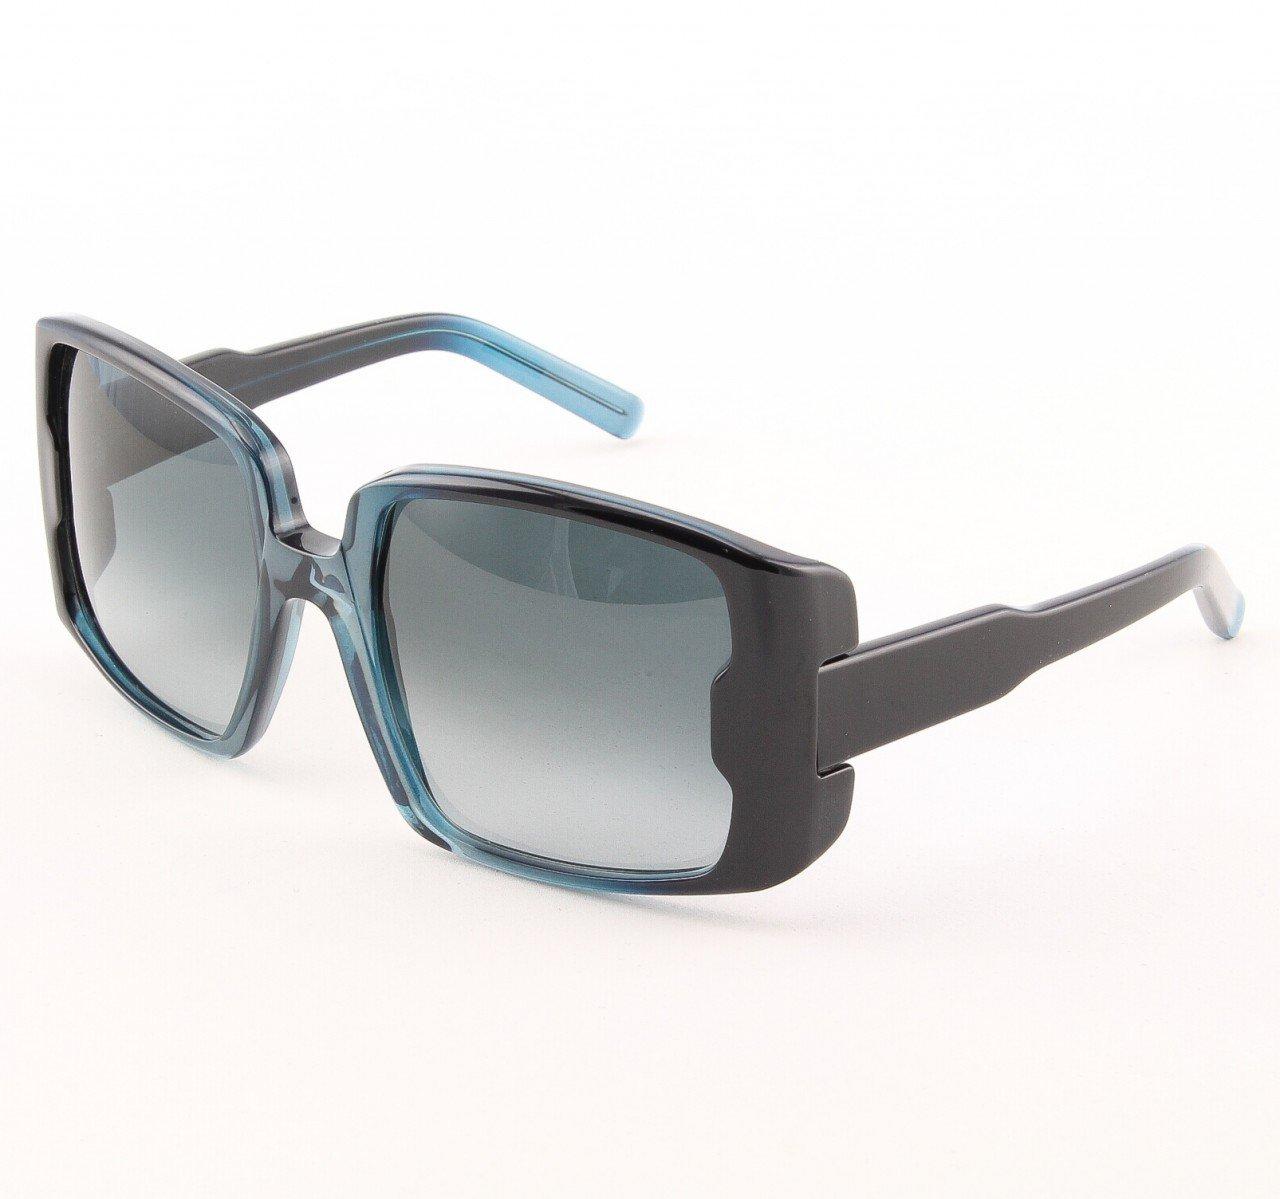 Marni MA154S Sunglasses Col. 03 Dark Navy with Gray Lenses